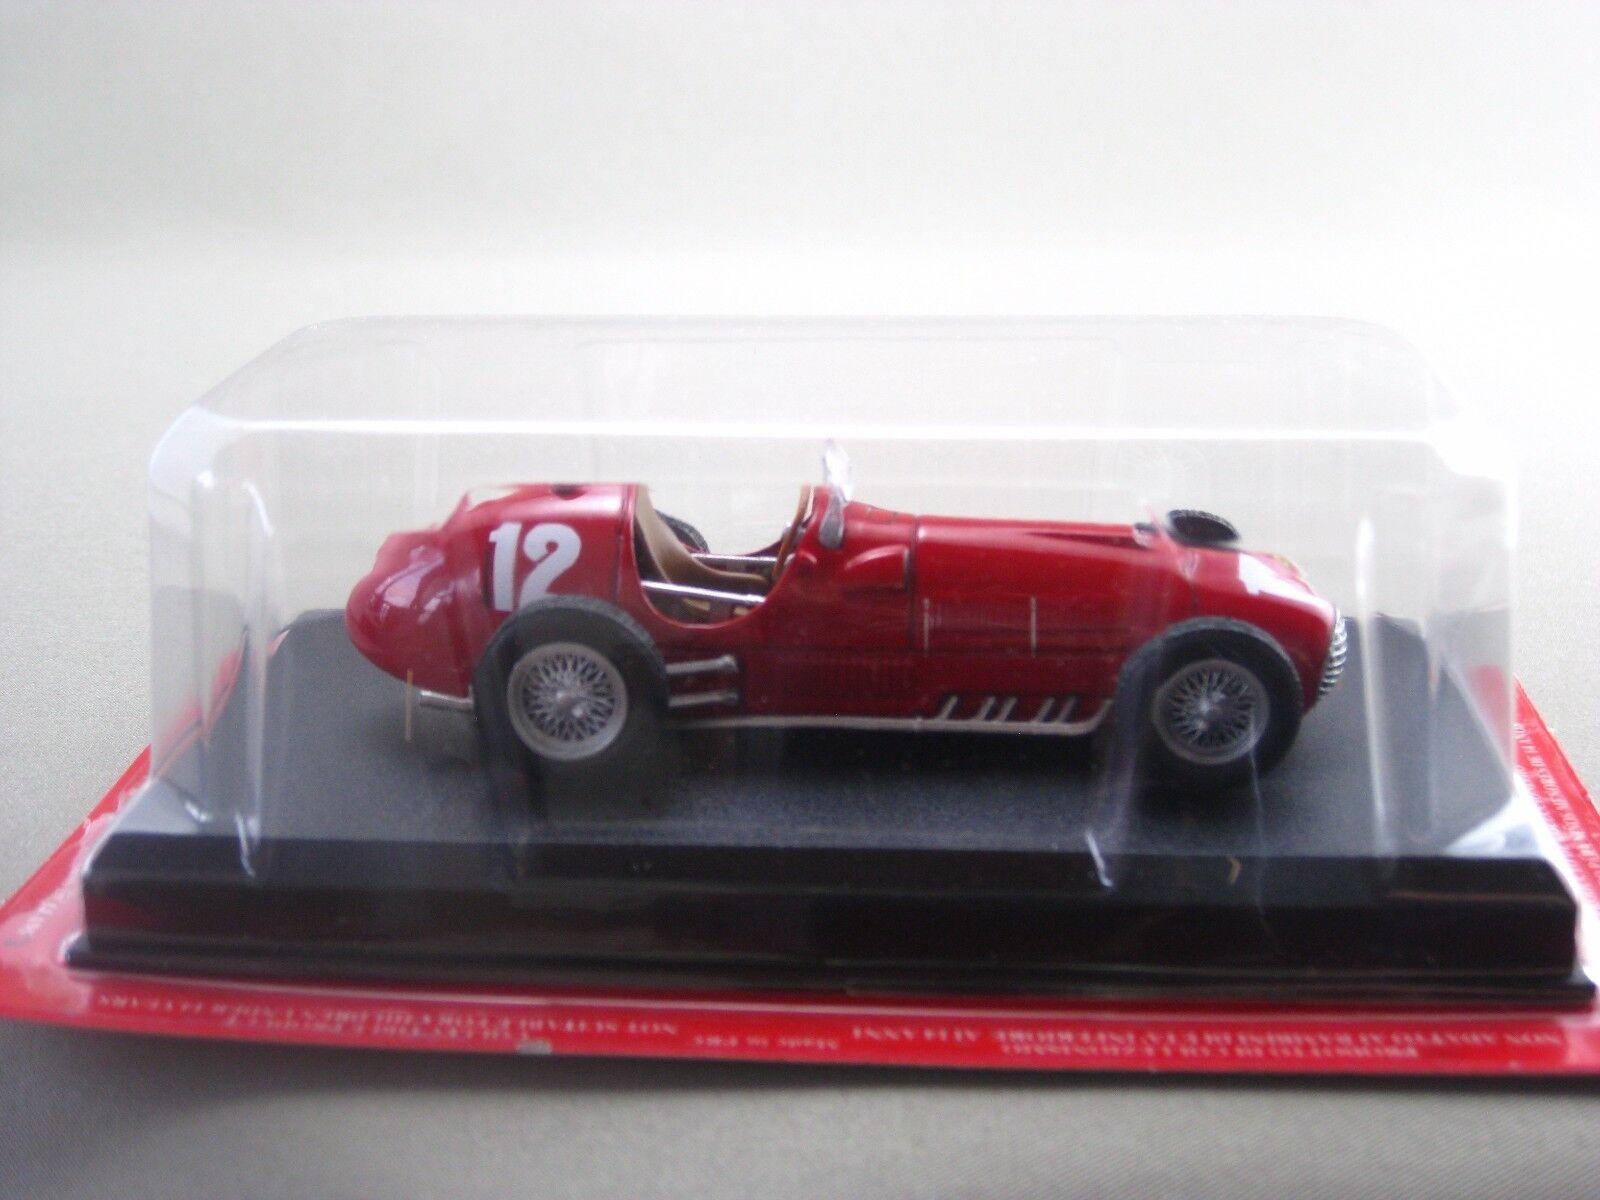 Ferrari 375 F1 Jose fronilan Gonzalez 1951 Hachette 1 43 Diecast Modelo Coche Vol.61